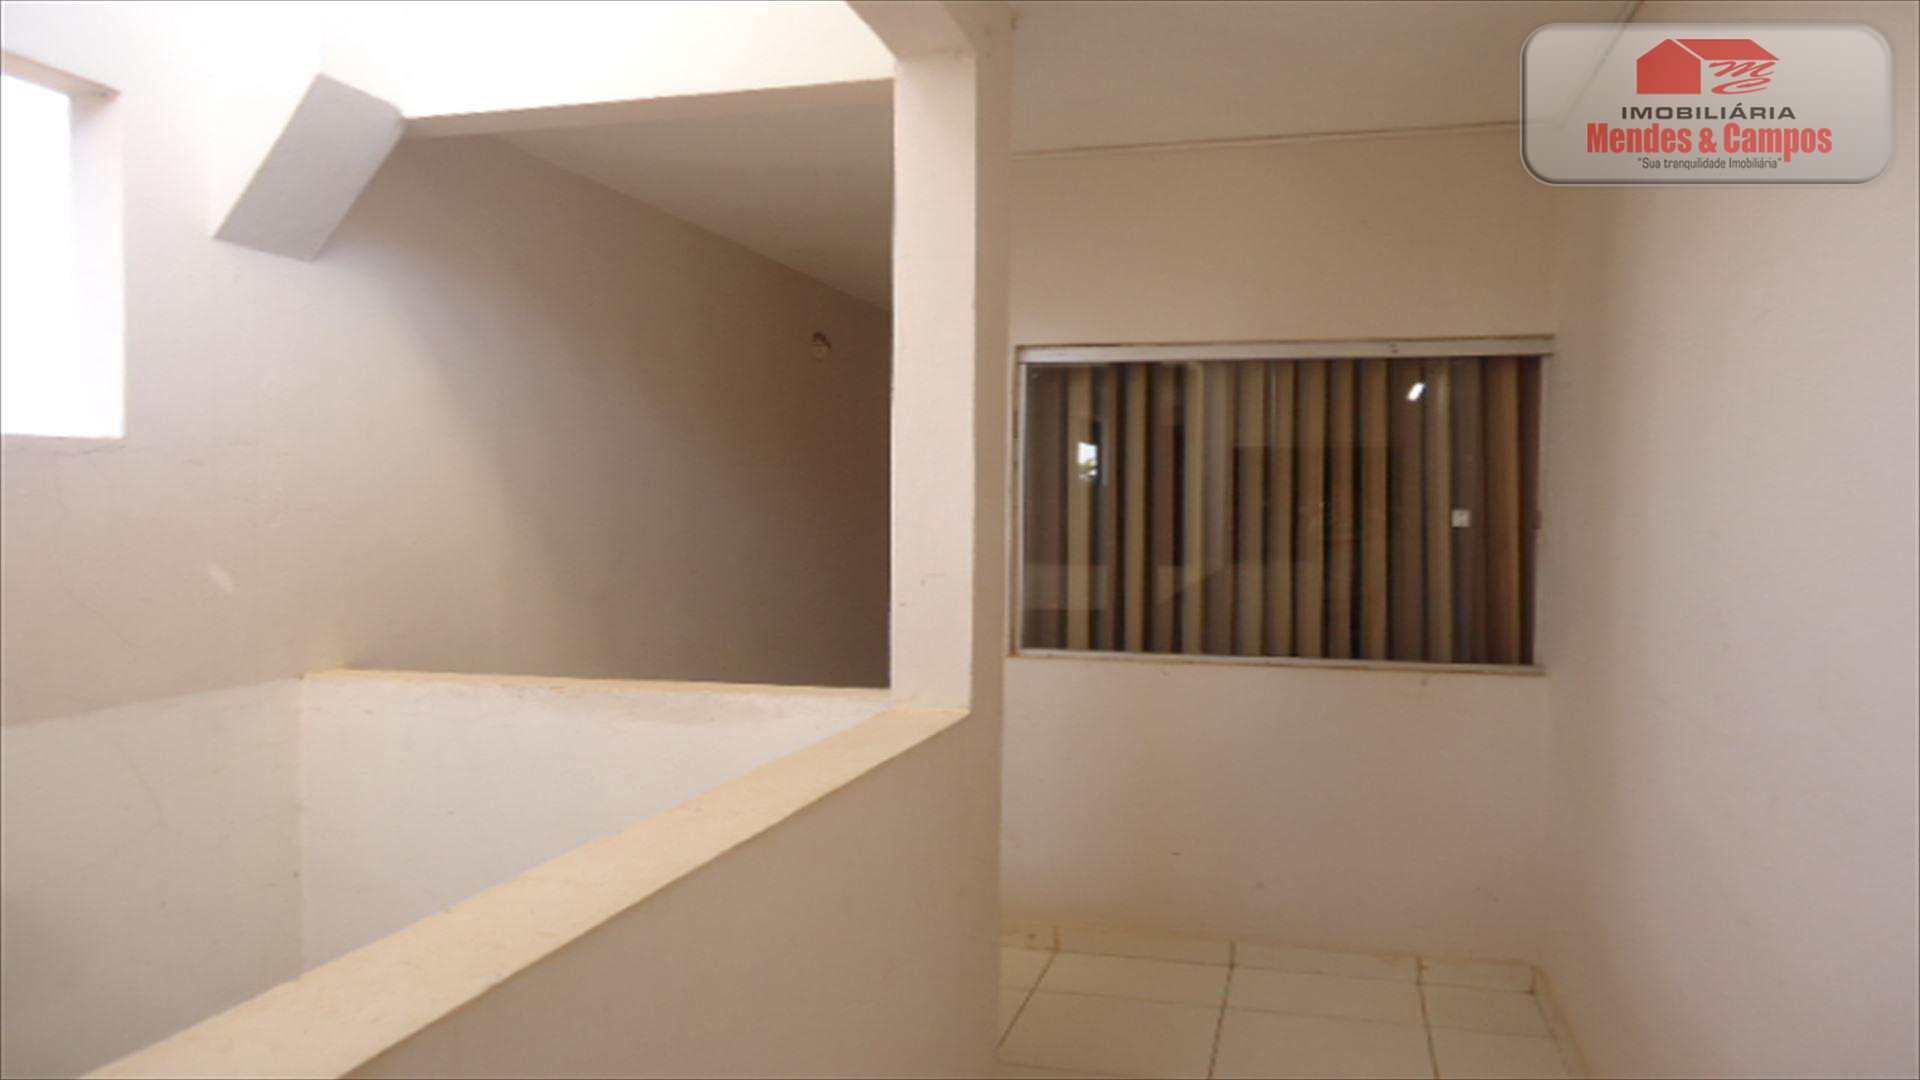 Rua Fortaleza nº 2099 Aptº 04 Setor 03, Cod: 359